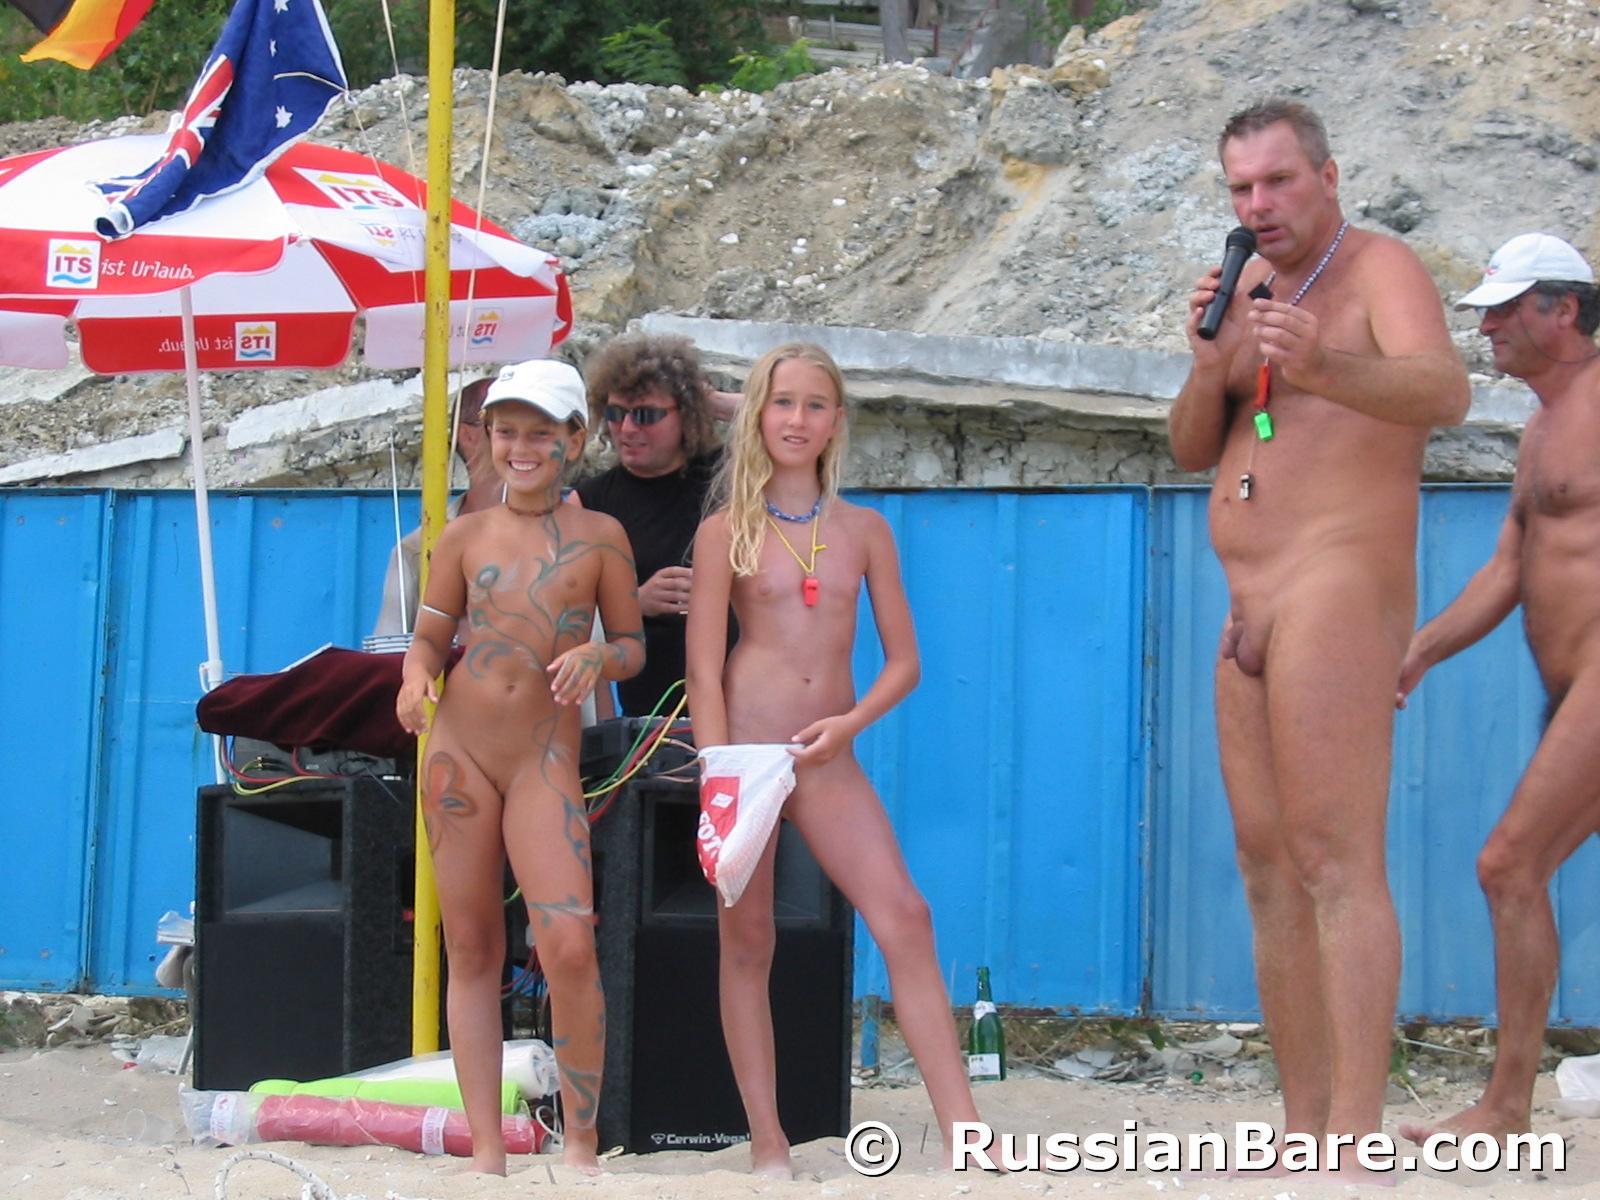 Glamour Badeanzug Junior nudist teeny fickt